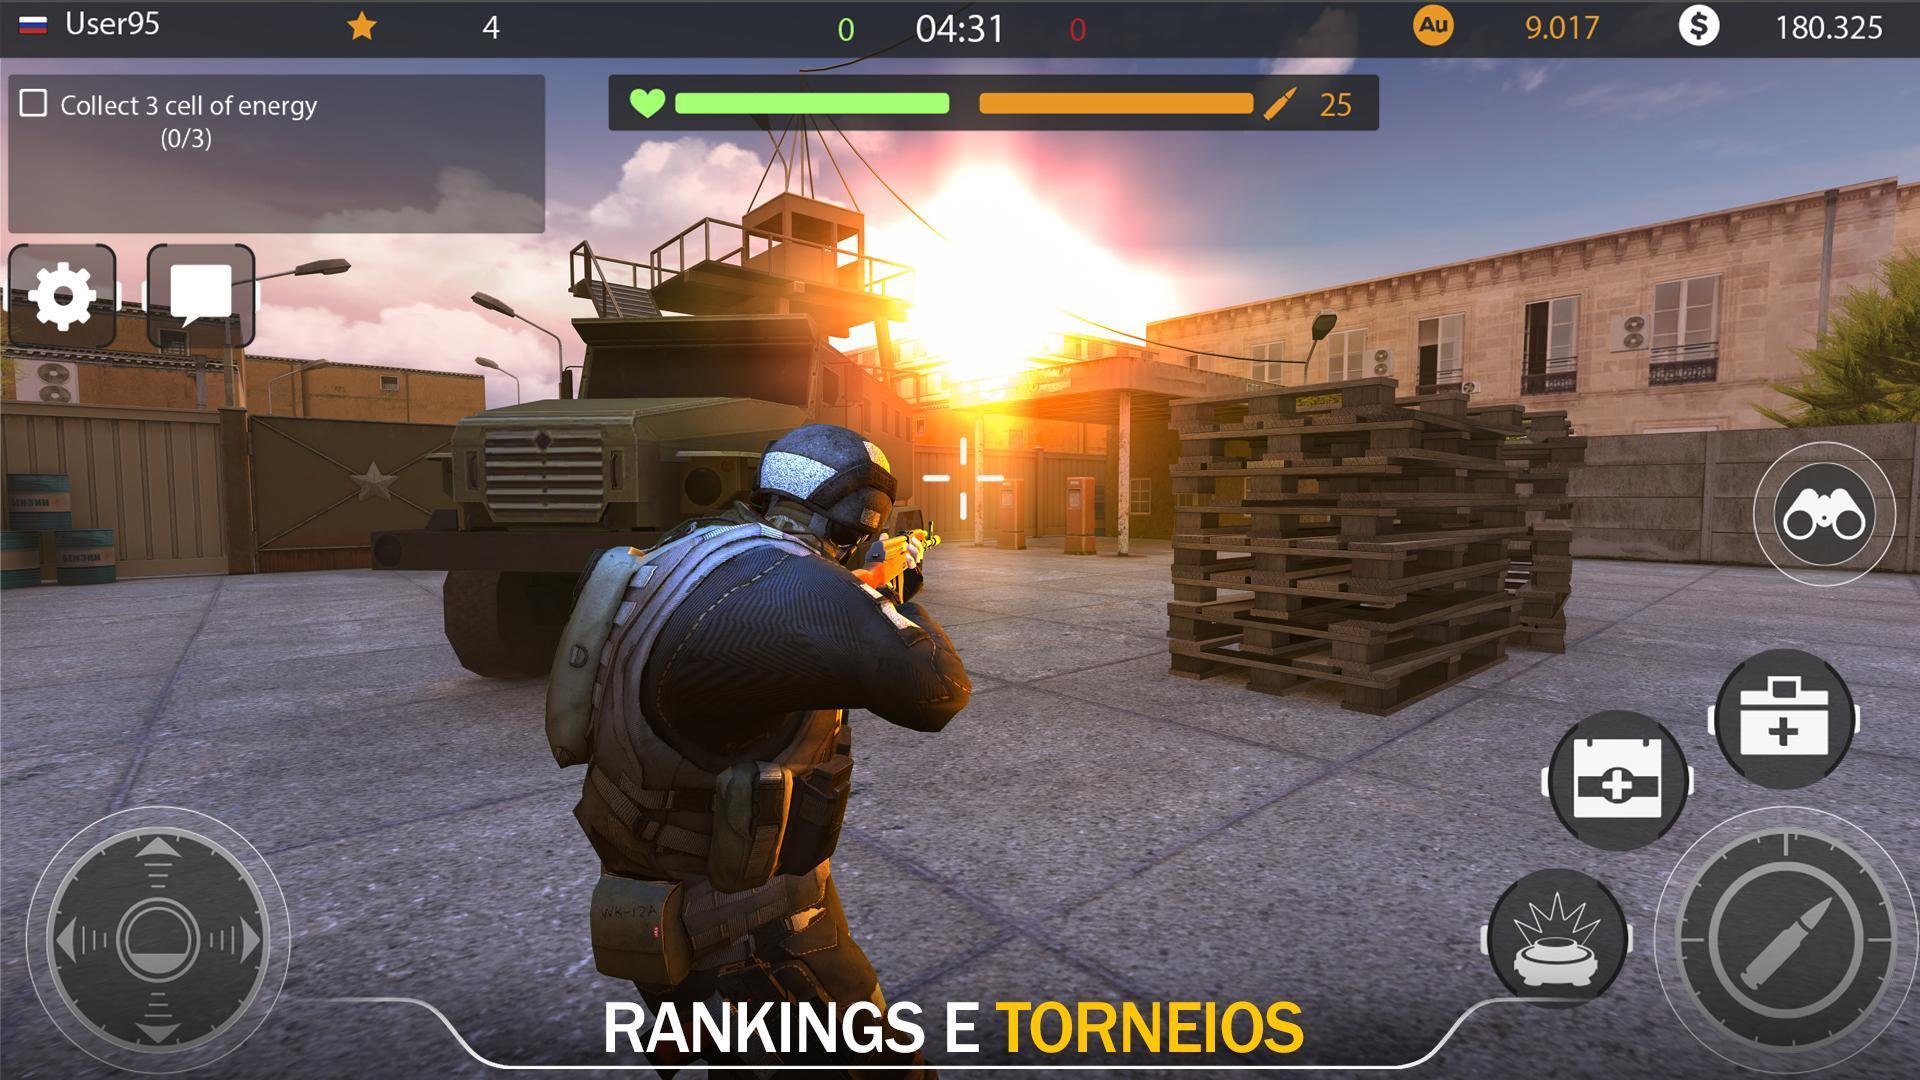 Code Of War Jogo De Tiro 3d Para Android Apk Baixar